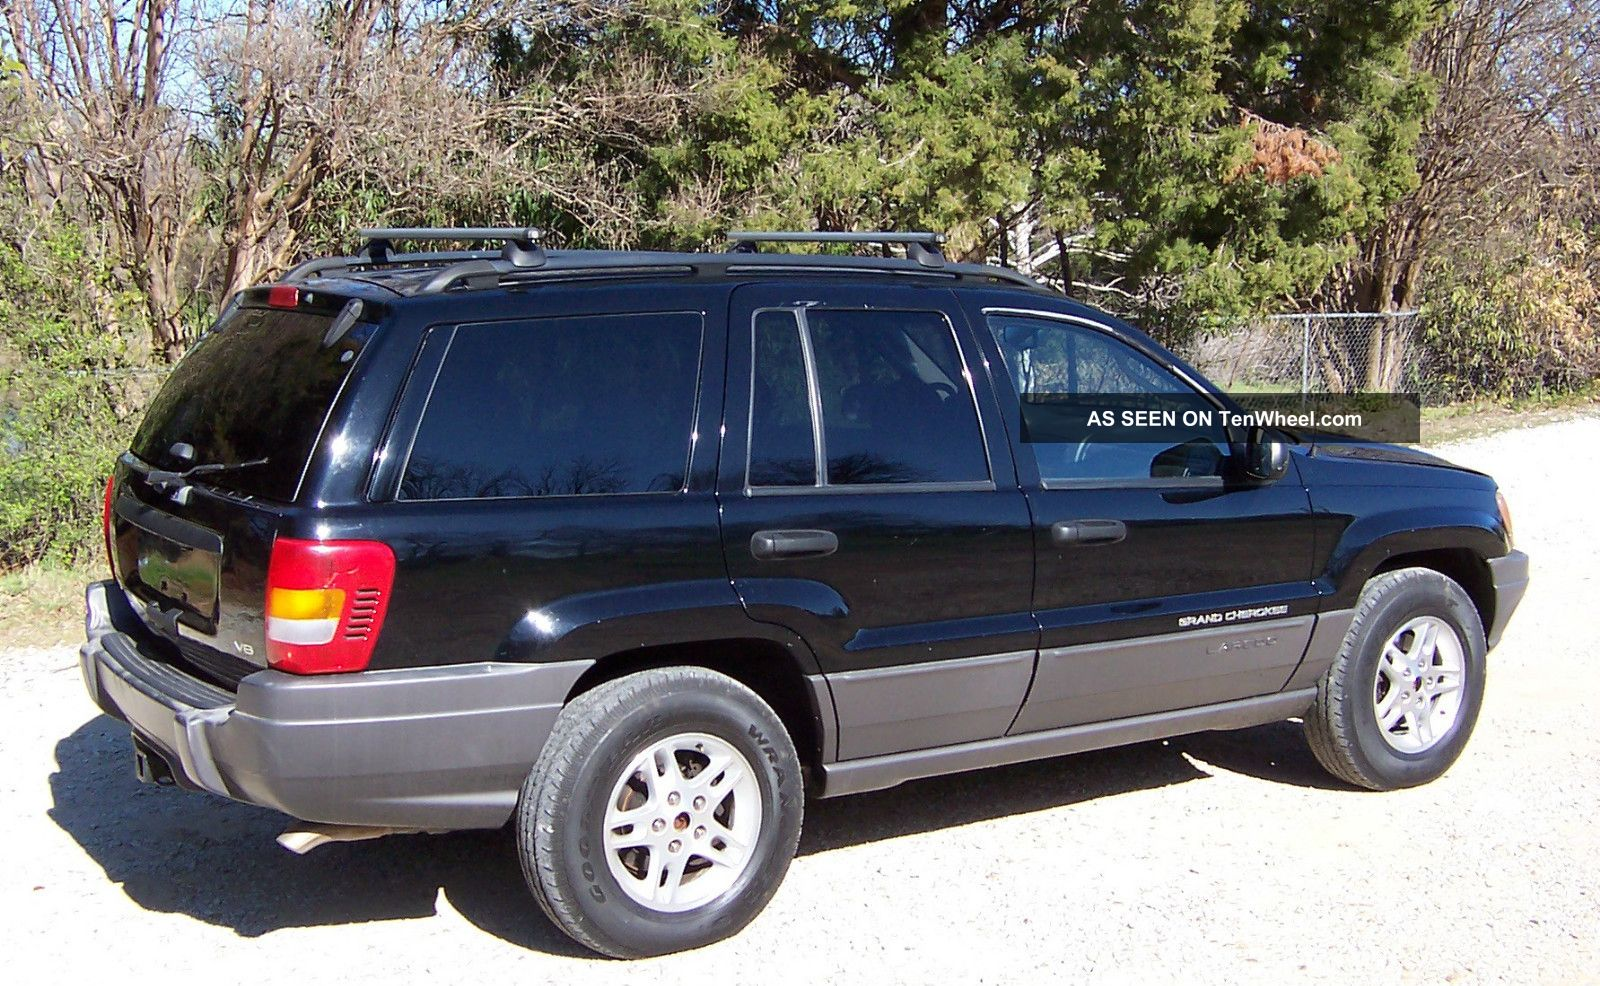 2002 jeep grand cherokee laredo v 8 black on black for 2002 jeep grand cherokee window motor